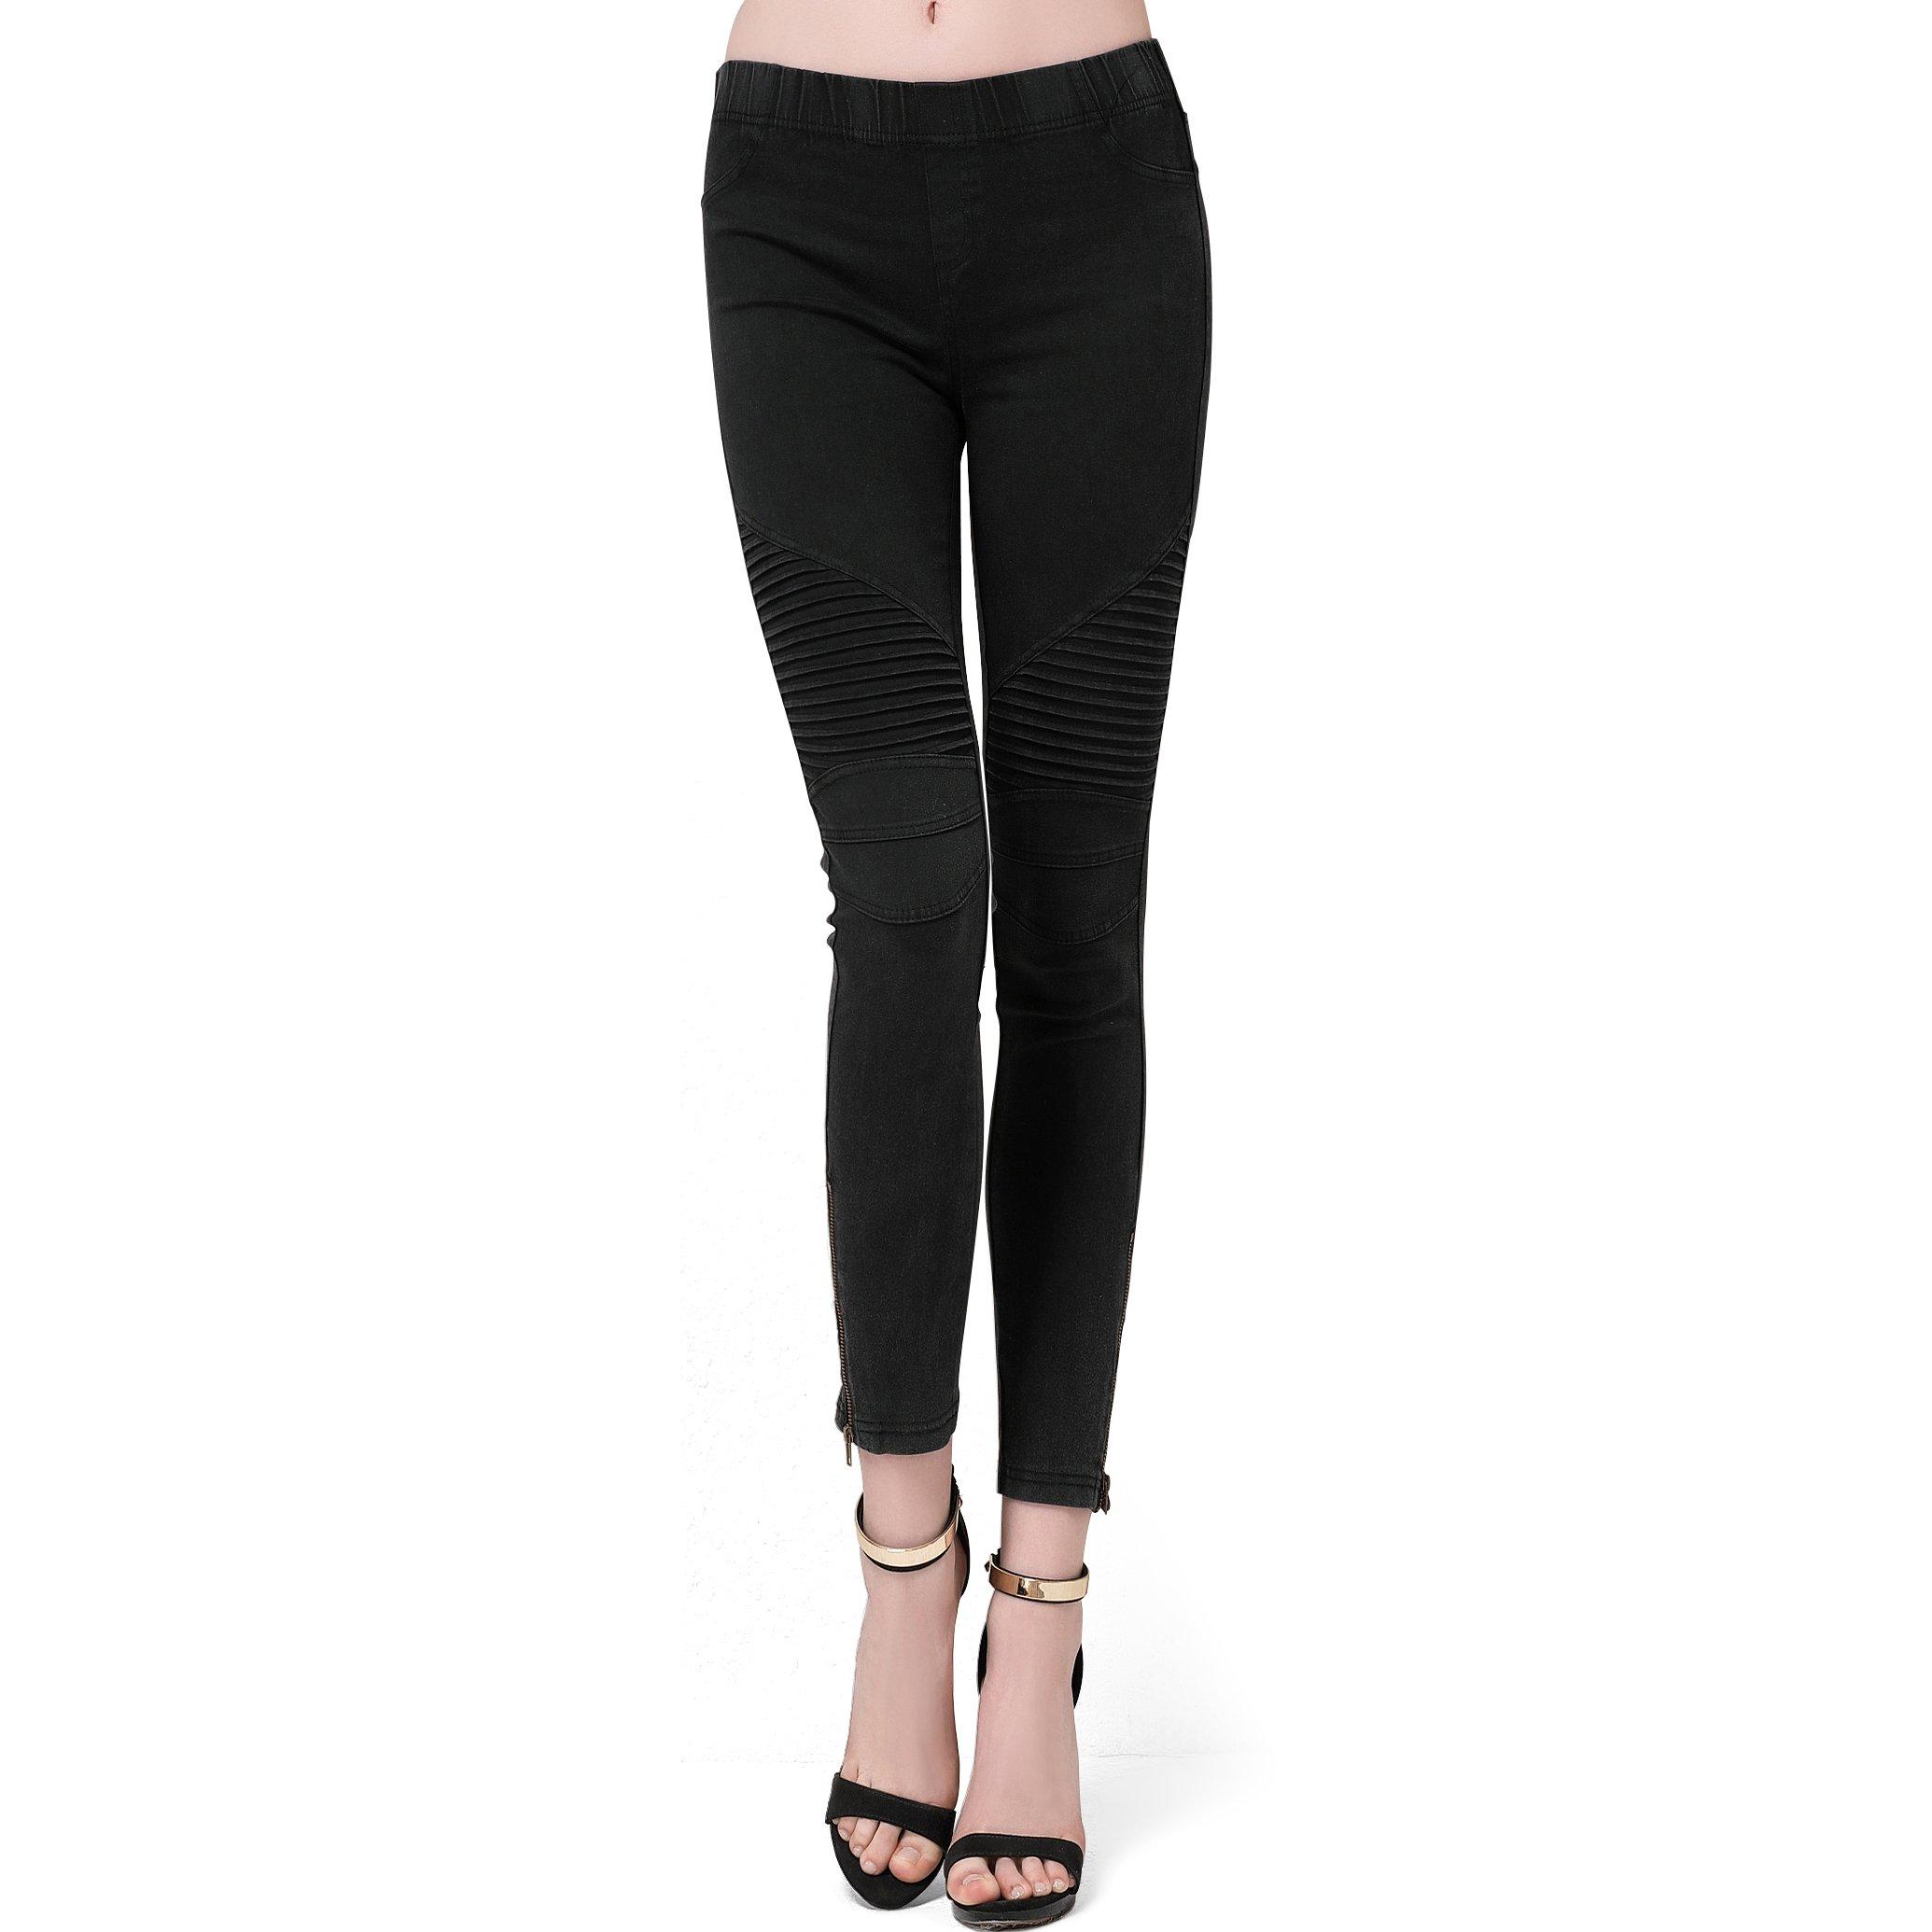 Bitlive Women's Comfy Stretch Ankle Zip Moto Skinny Pants (Large, black)